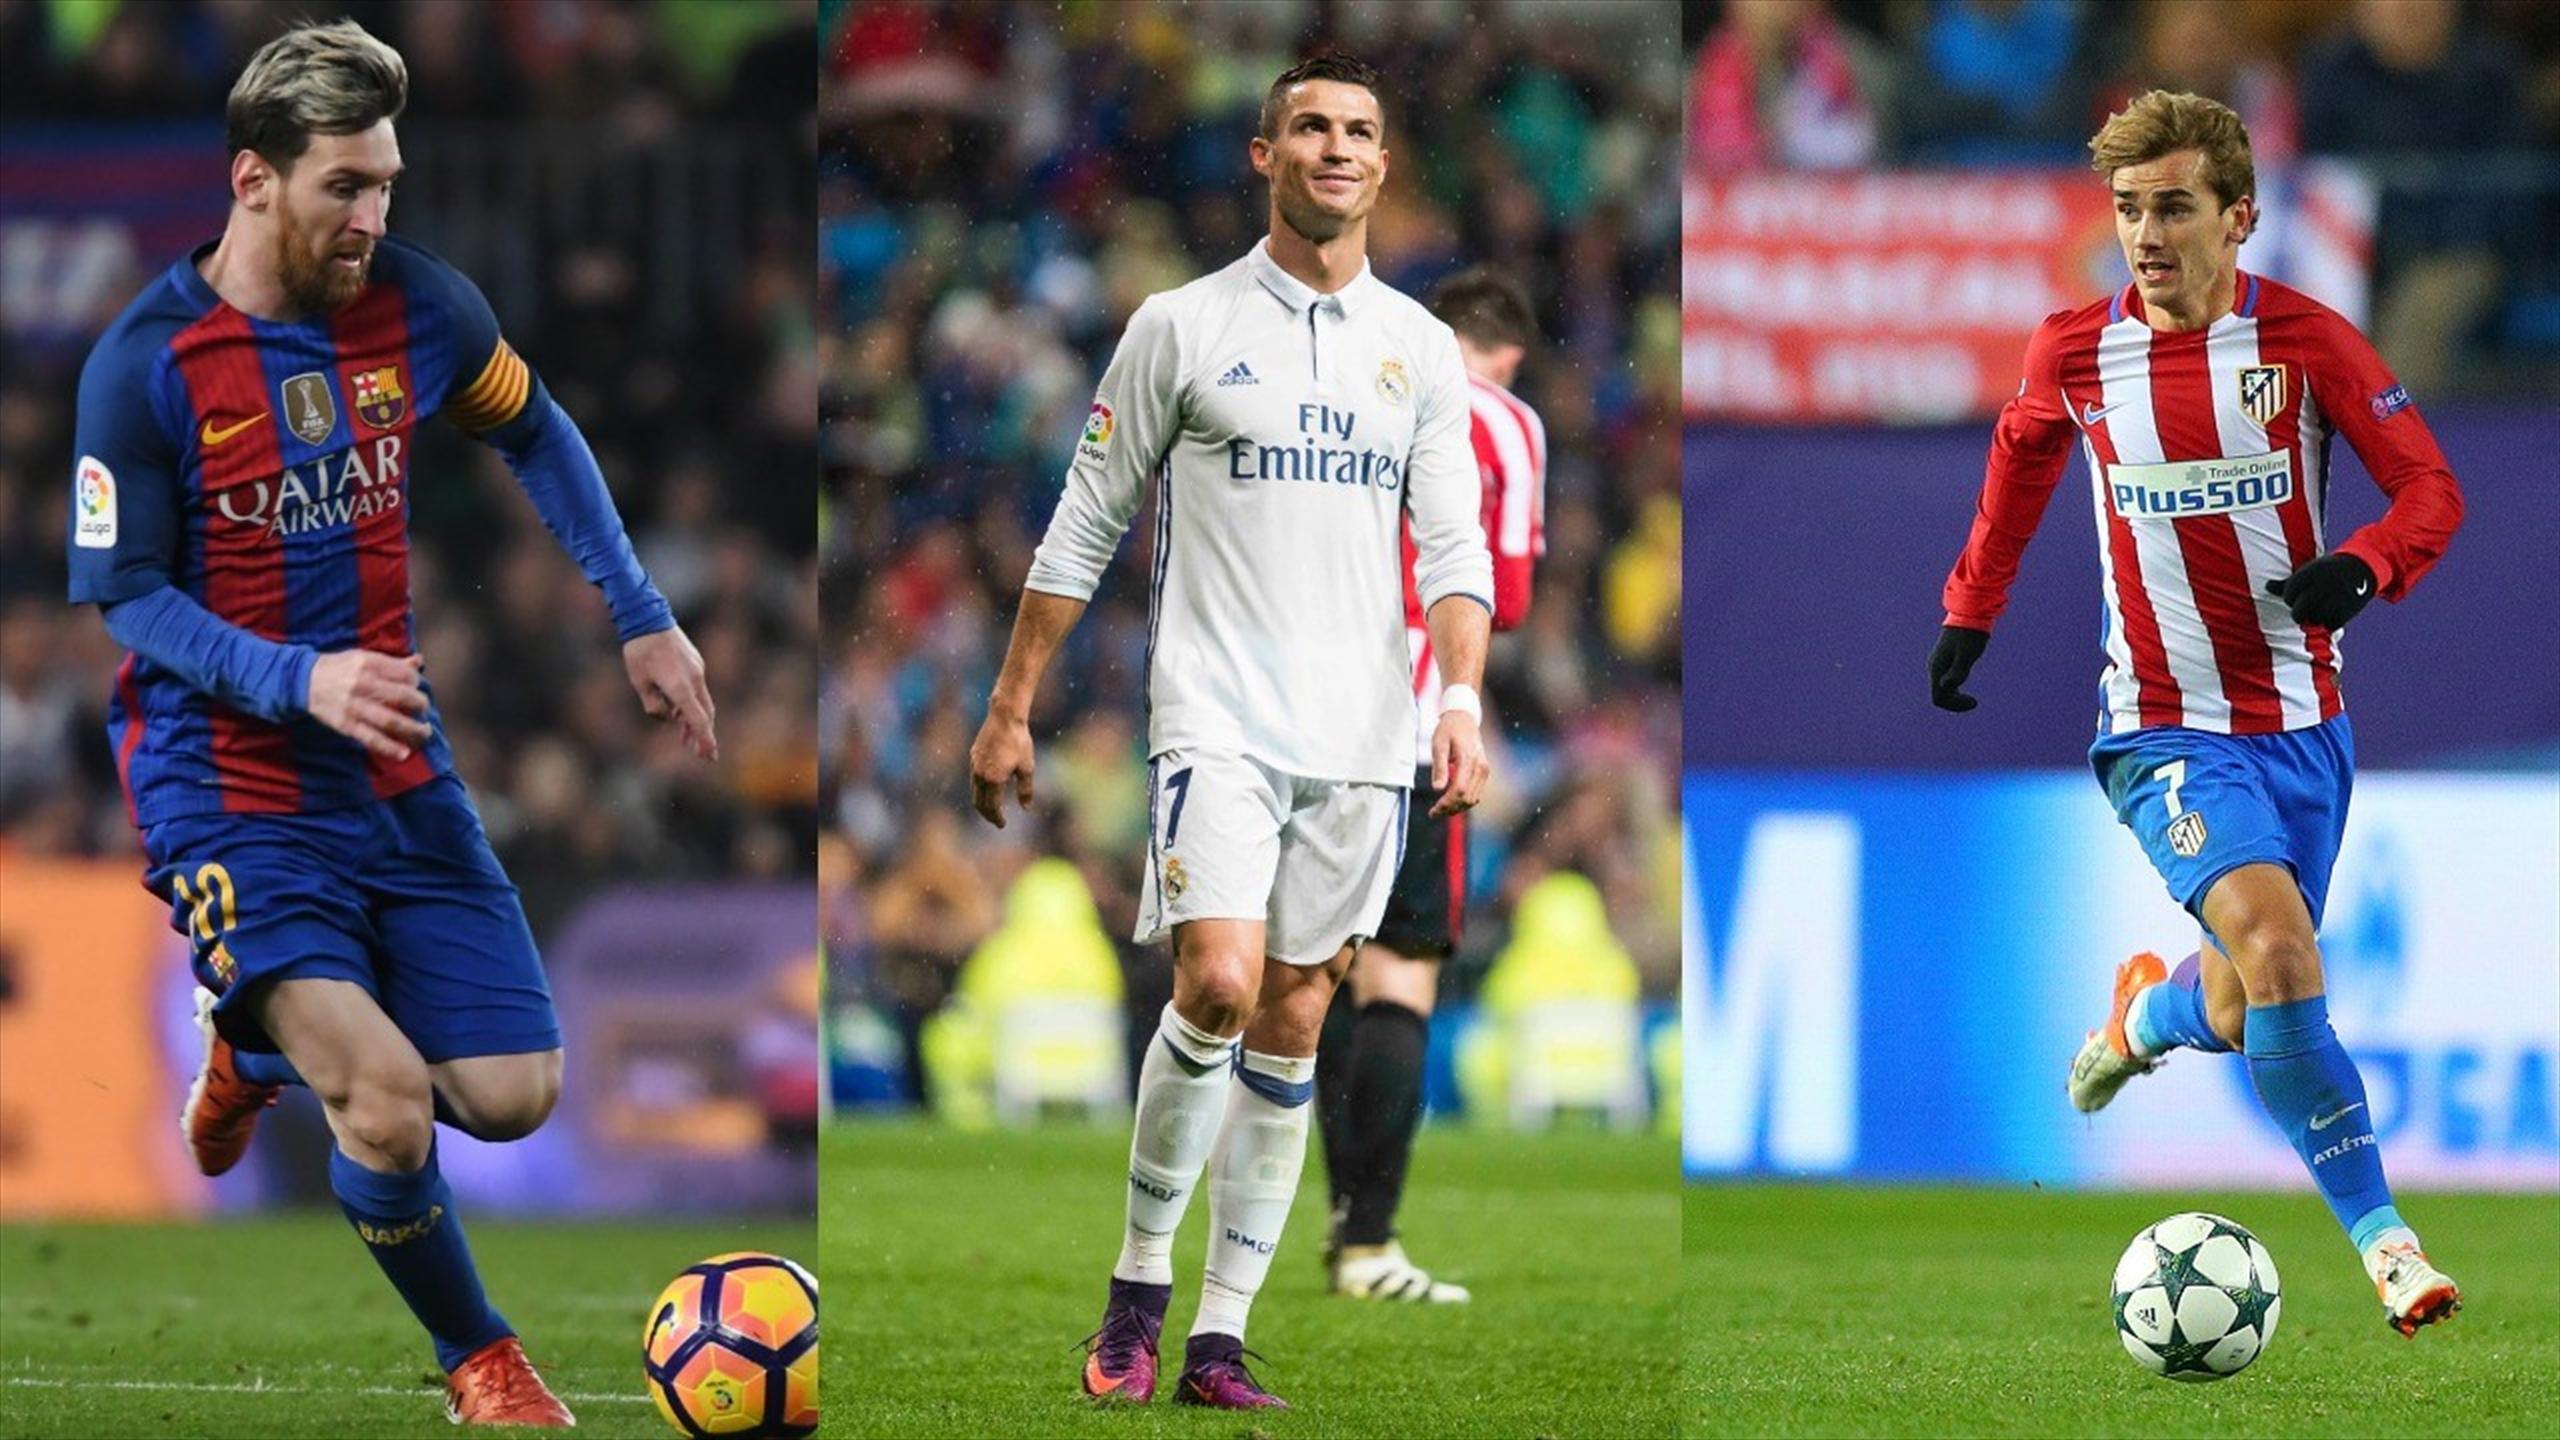 Lionel Messi, Cristiano Ronaldo et Antoine Griezmann